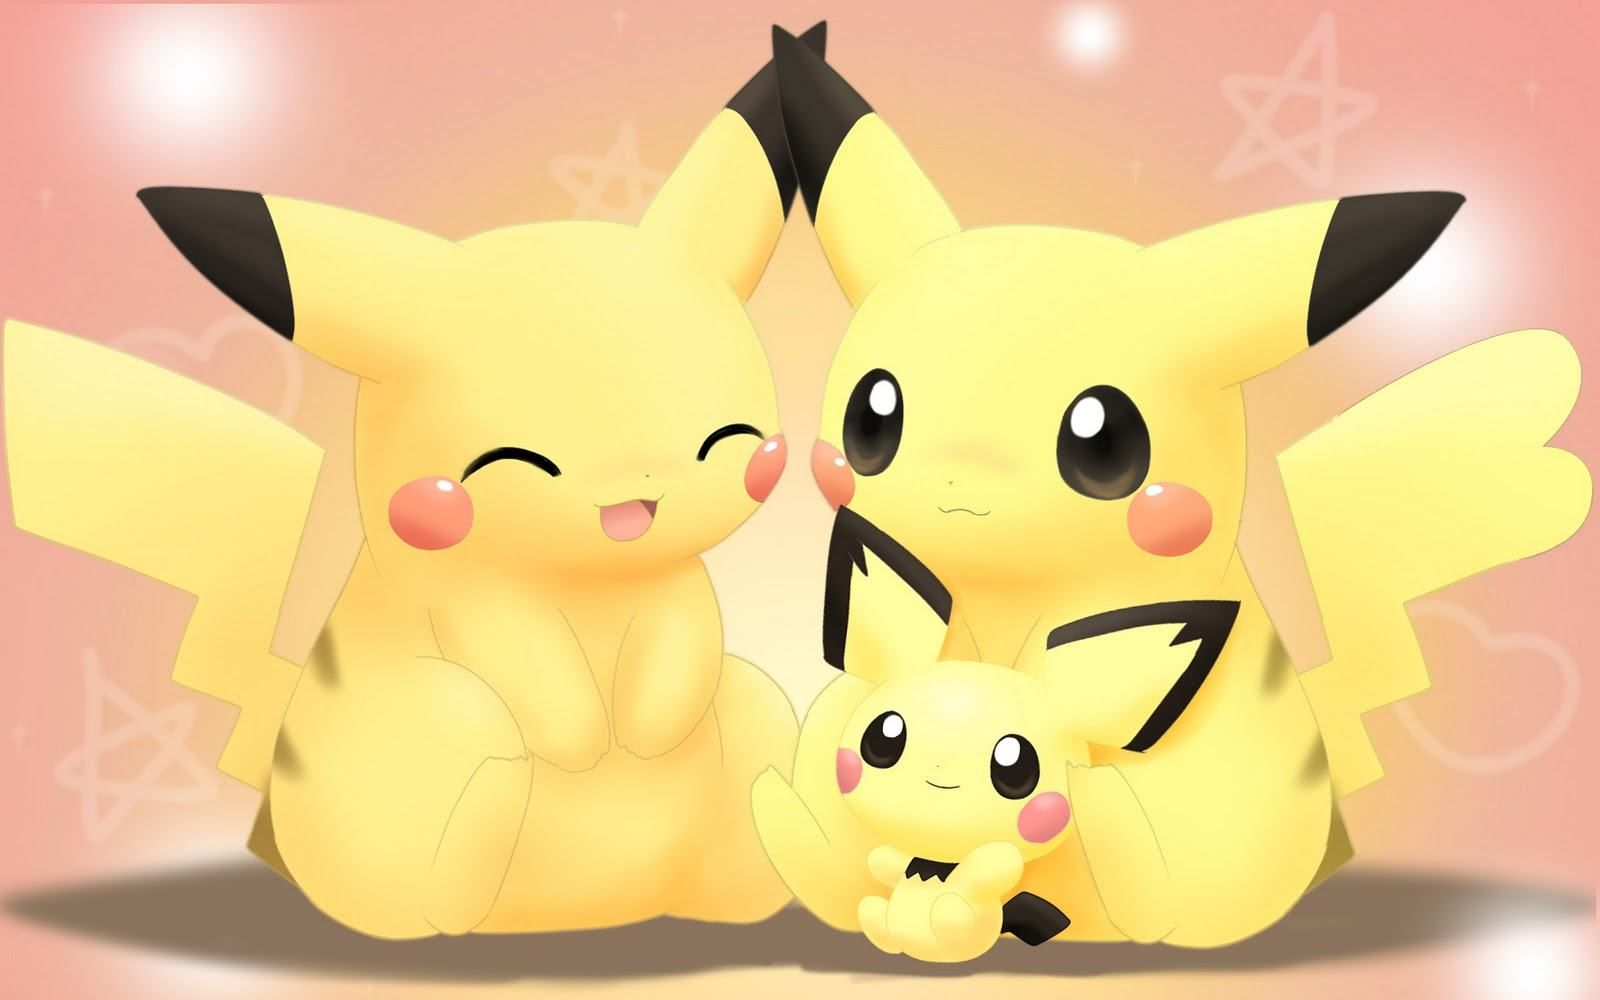 Cute Wallpapers Download Free Cute Pokemon Wallpaper Pikachu